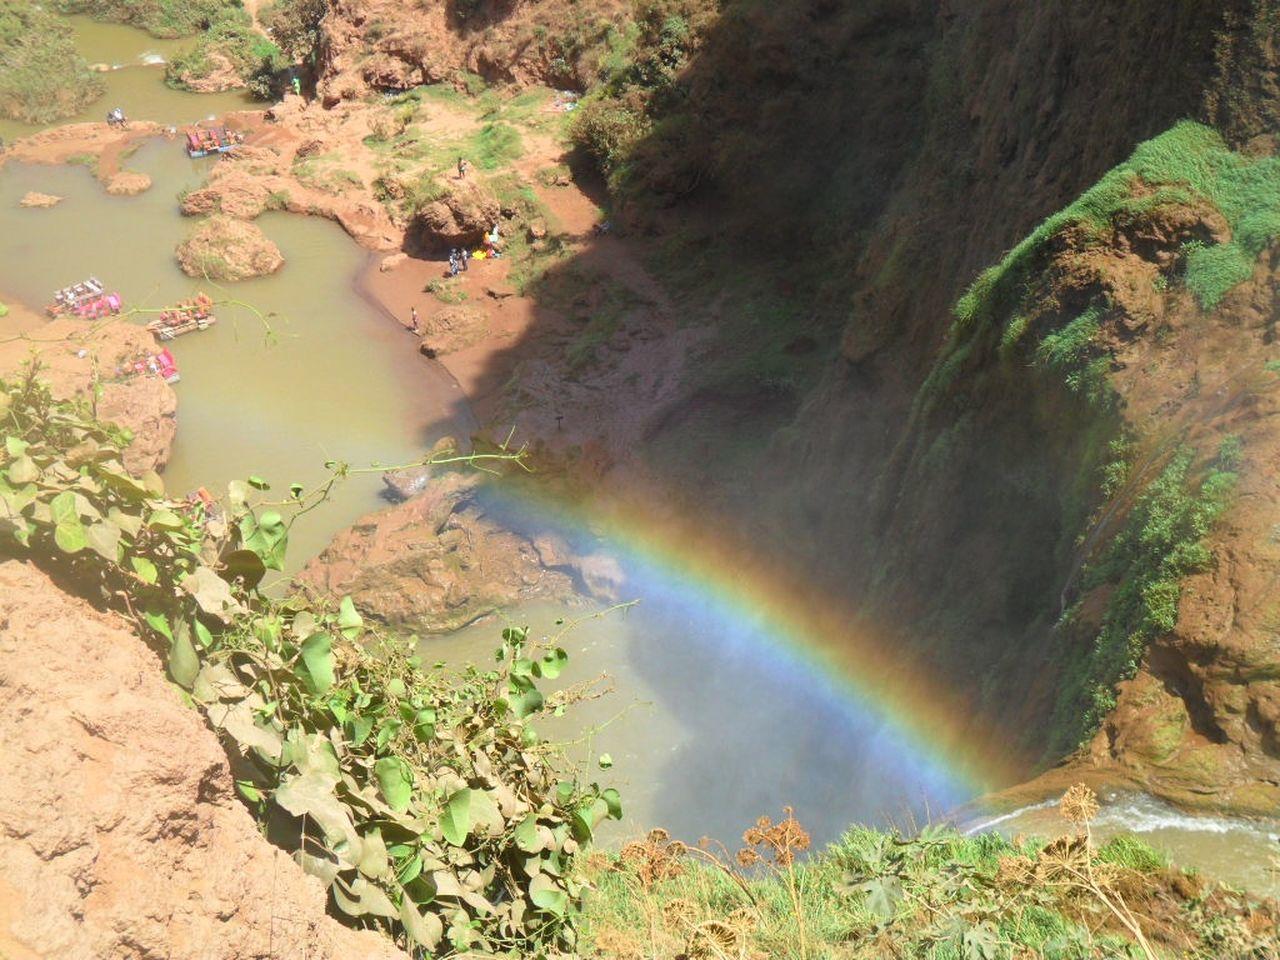 43 Golden Moments Holiday Memories Ouzoud Falls Marrakech Morocco Rainbow